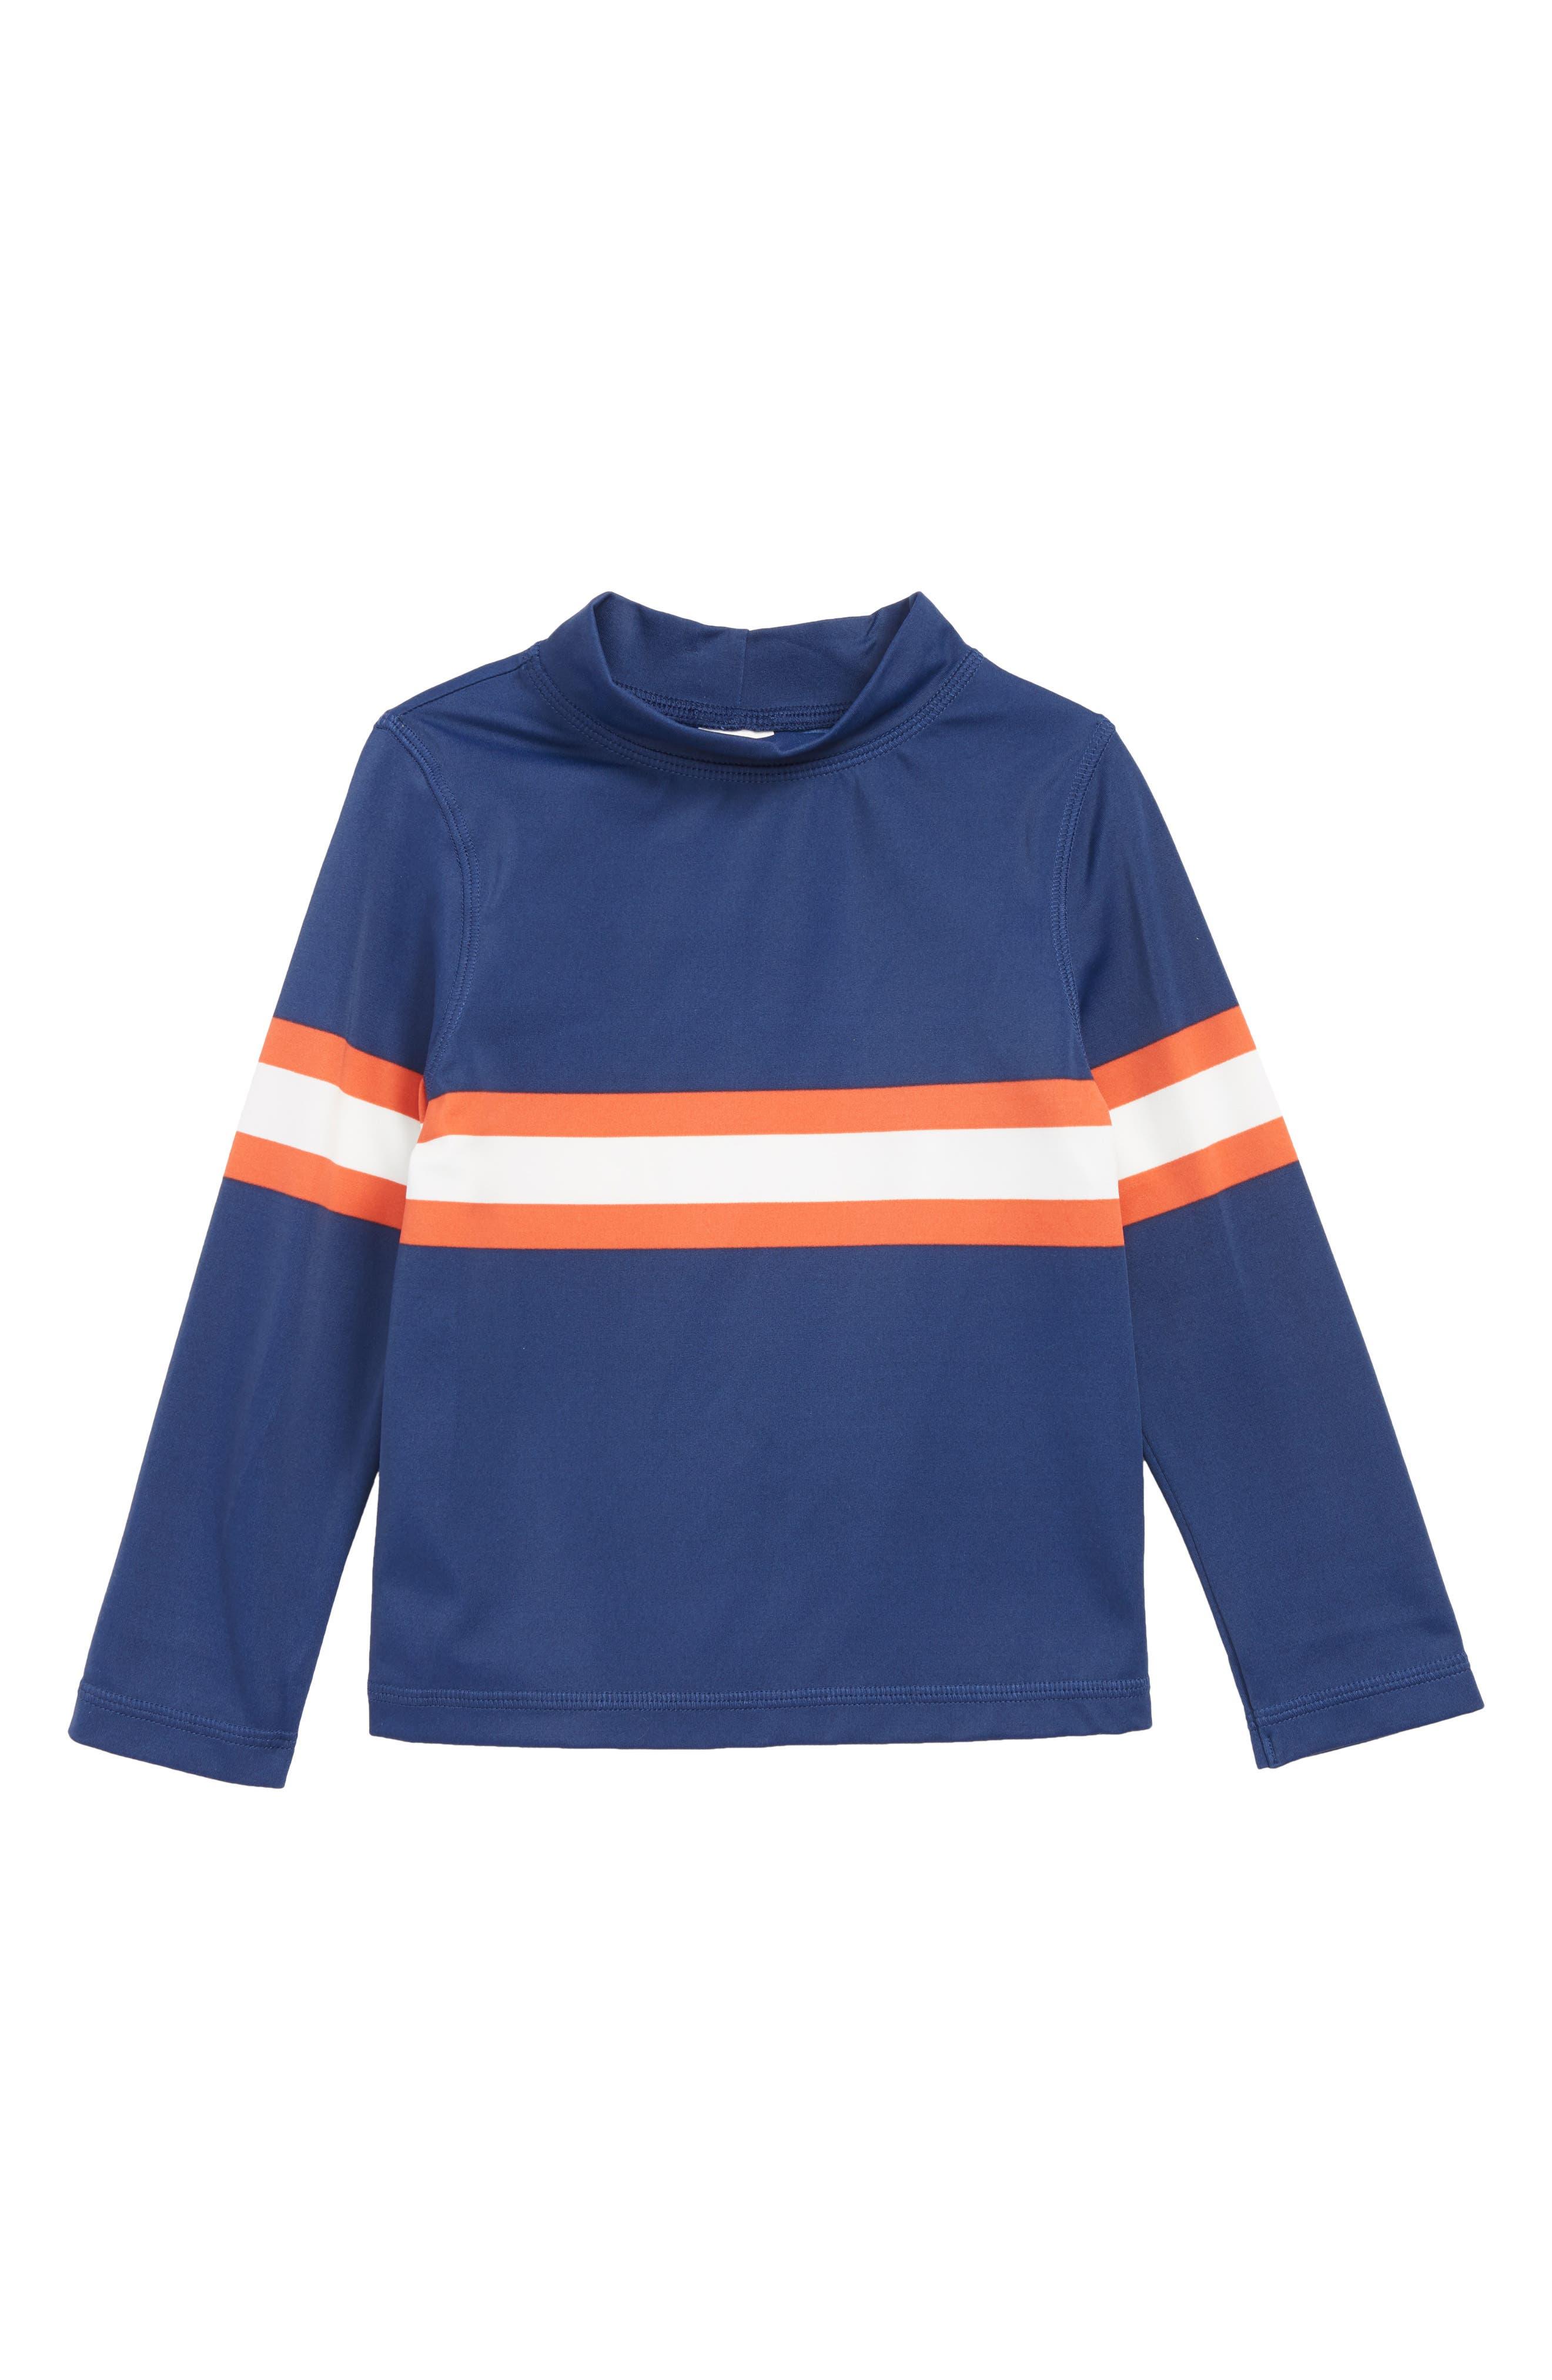 Toddler Boys Mini Boden Chest Stripe Rashguard Size 34Y  Blue